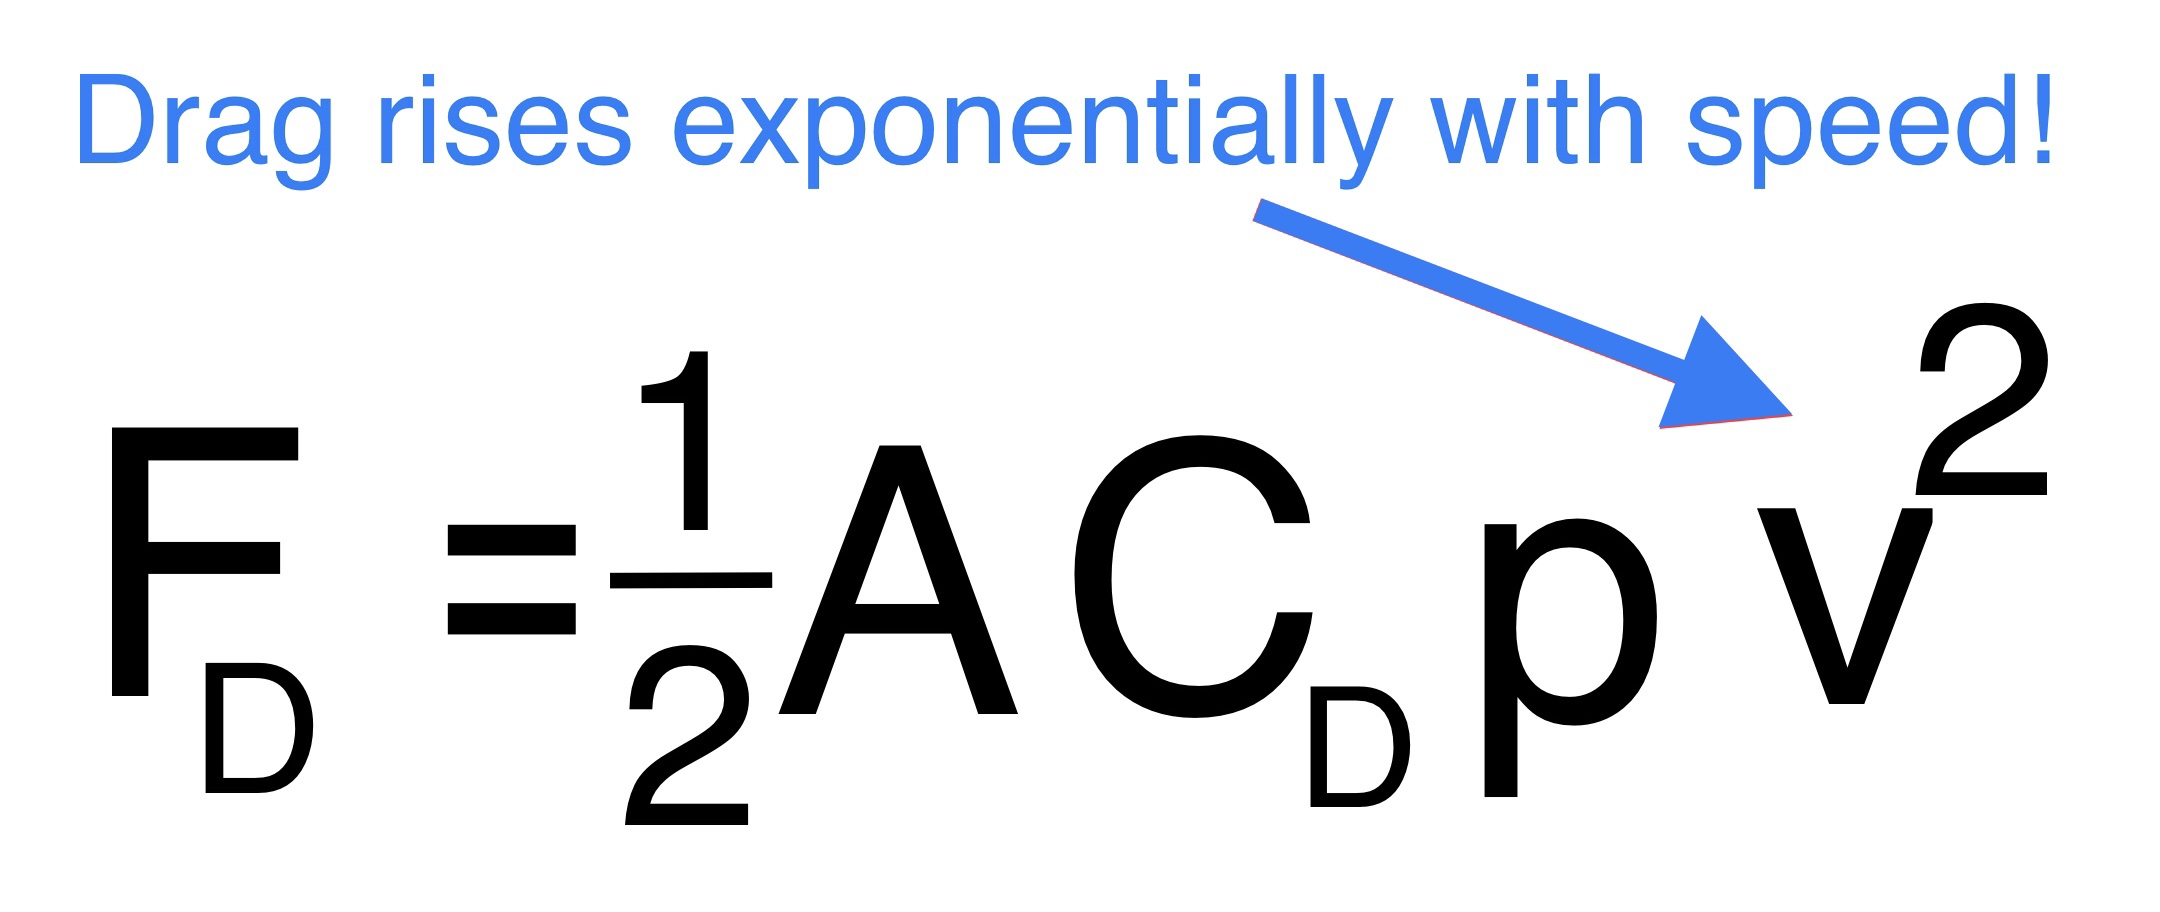 Drag / required thrust formula